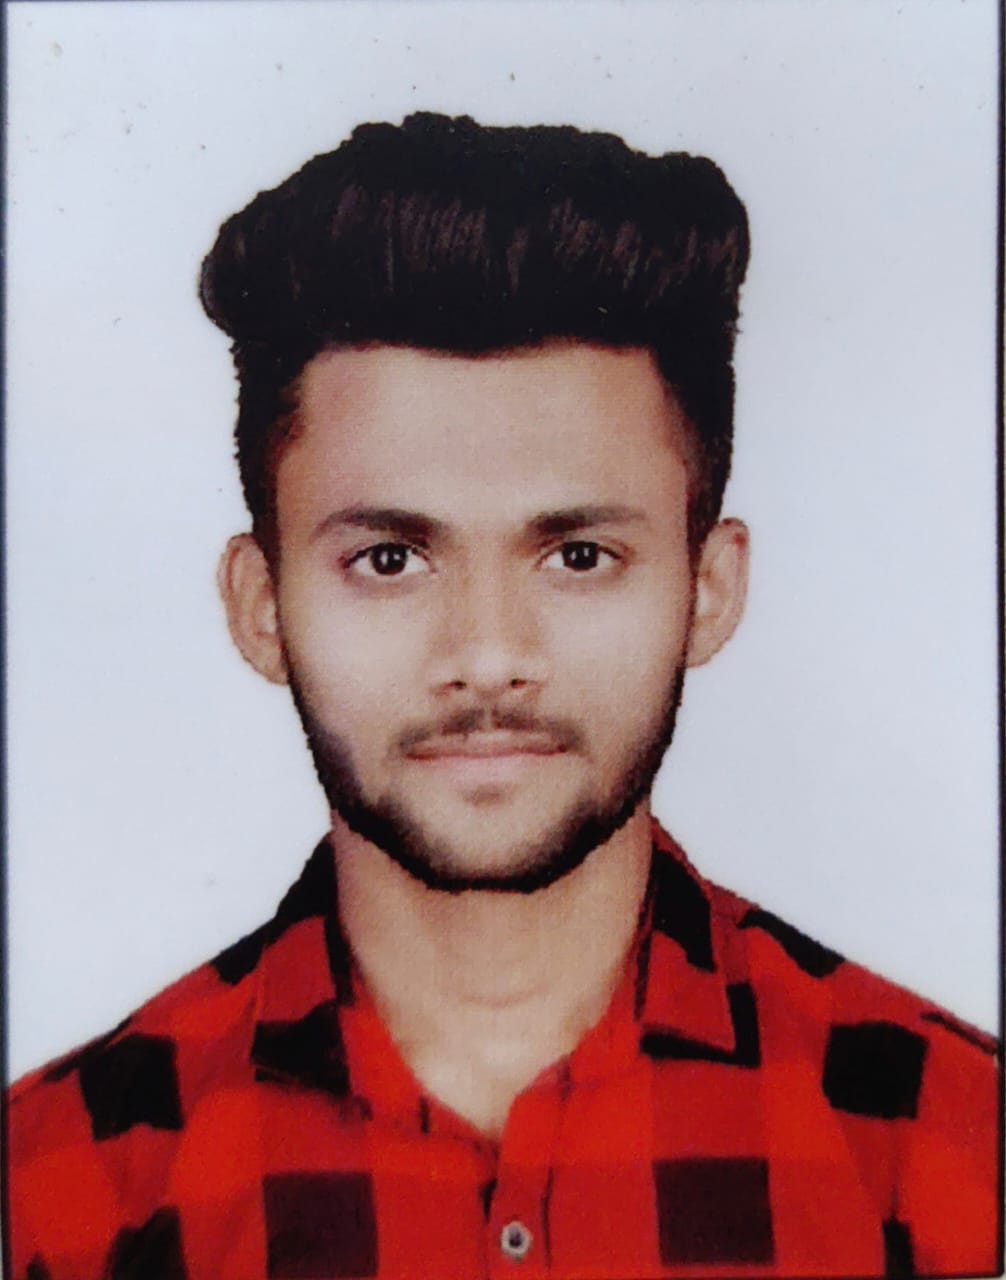 Prajwal Deepak Patil